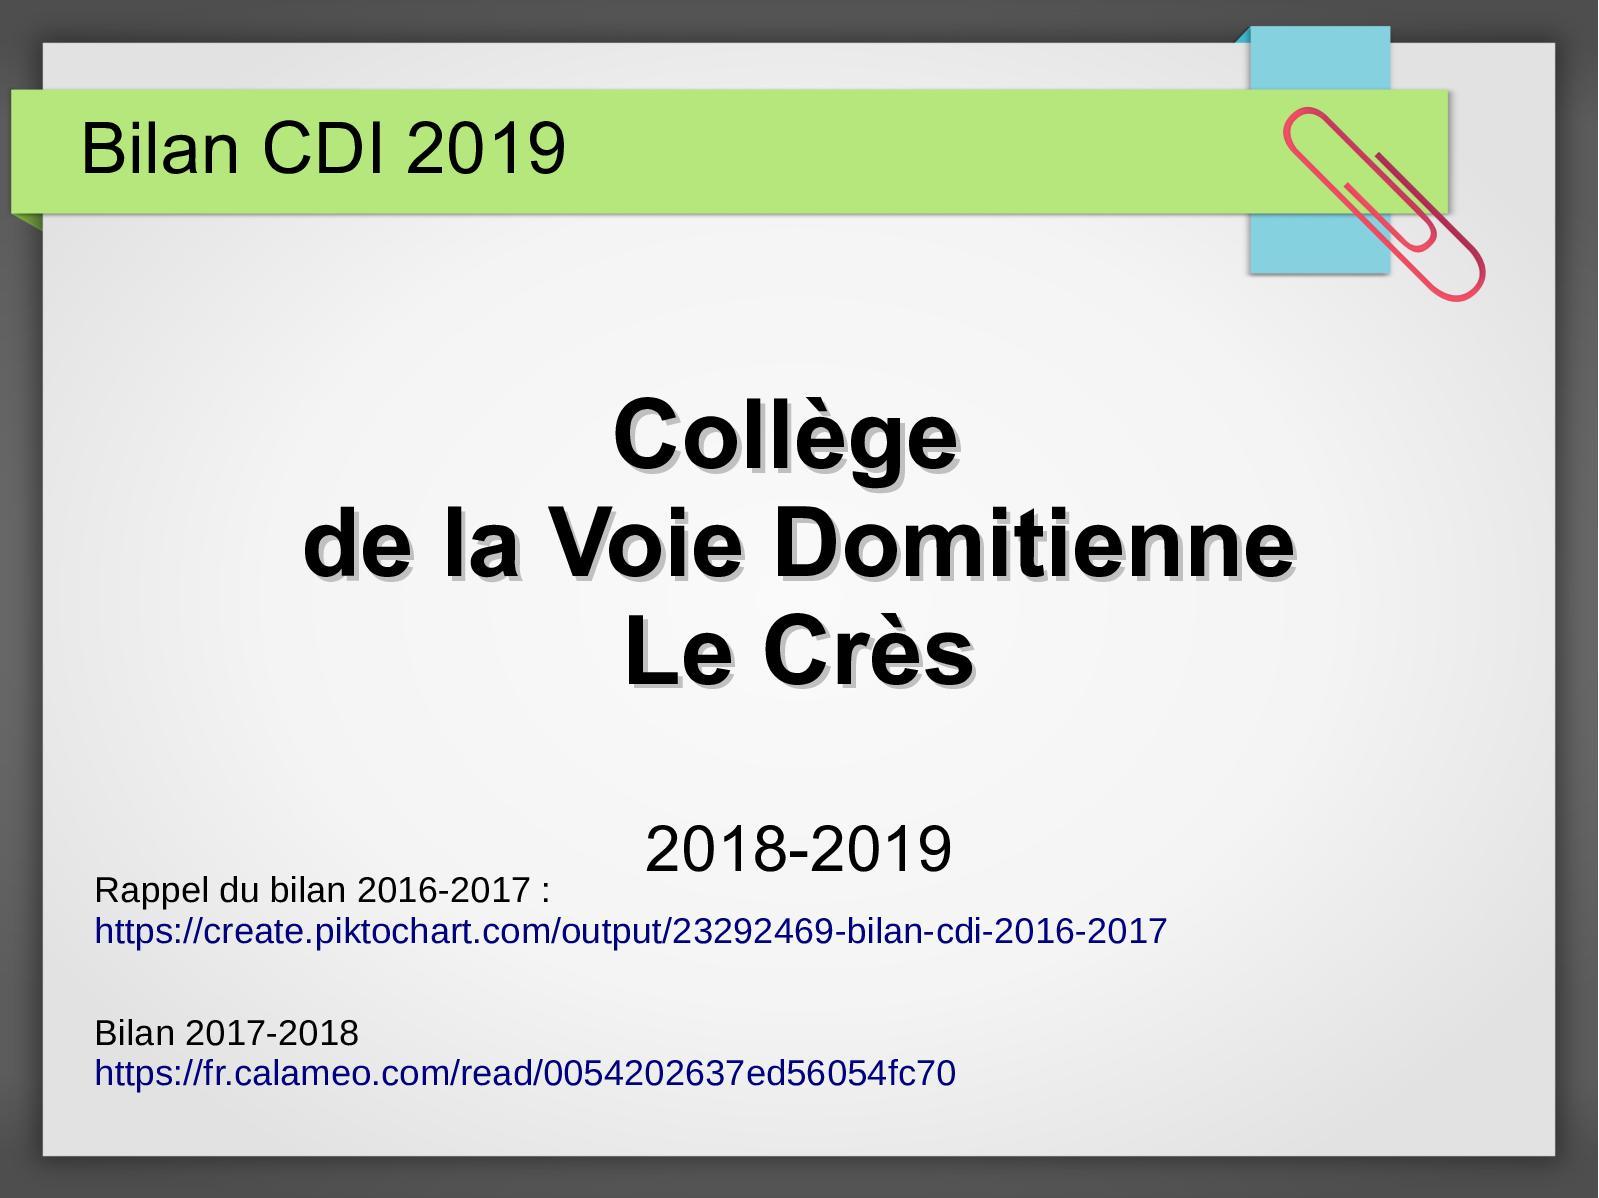 Calameo Bilan 2019